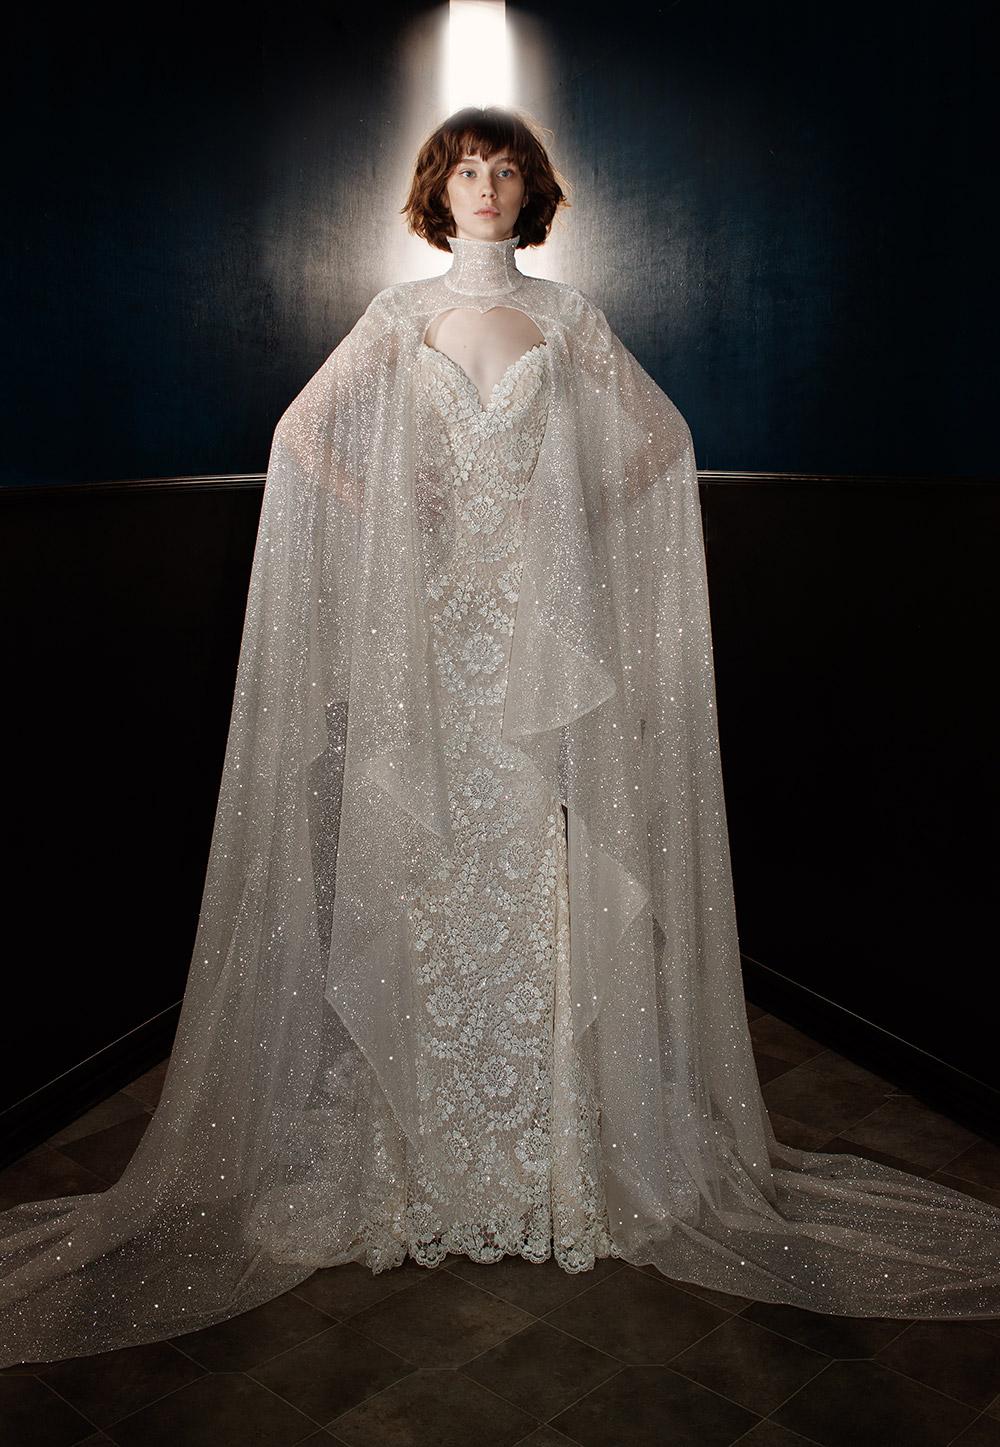 Rayne with Sterling Cape - Galia Lahav Spring 2018 Bridal Collection. www.theweddingnotebook.com